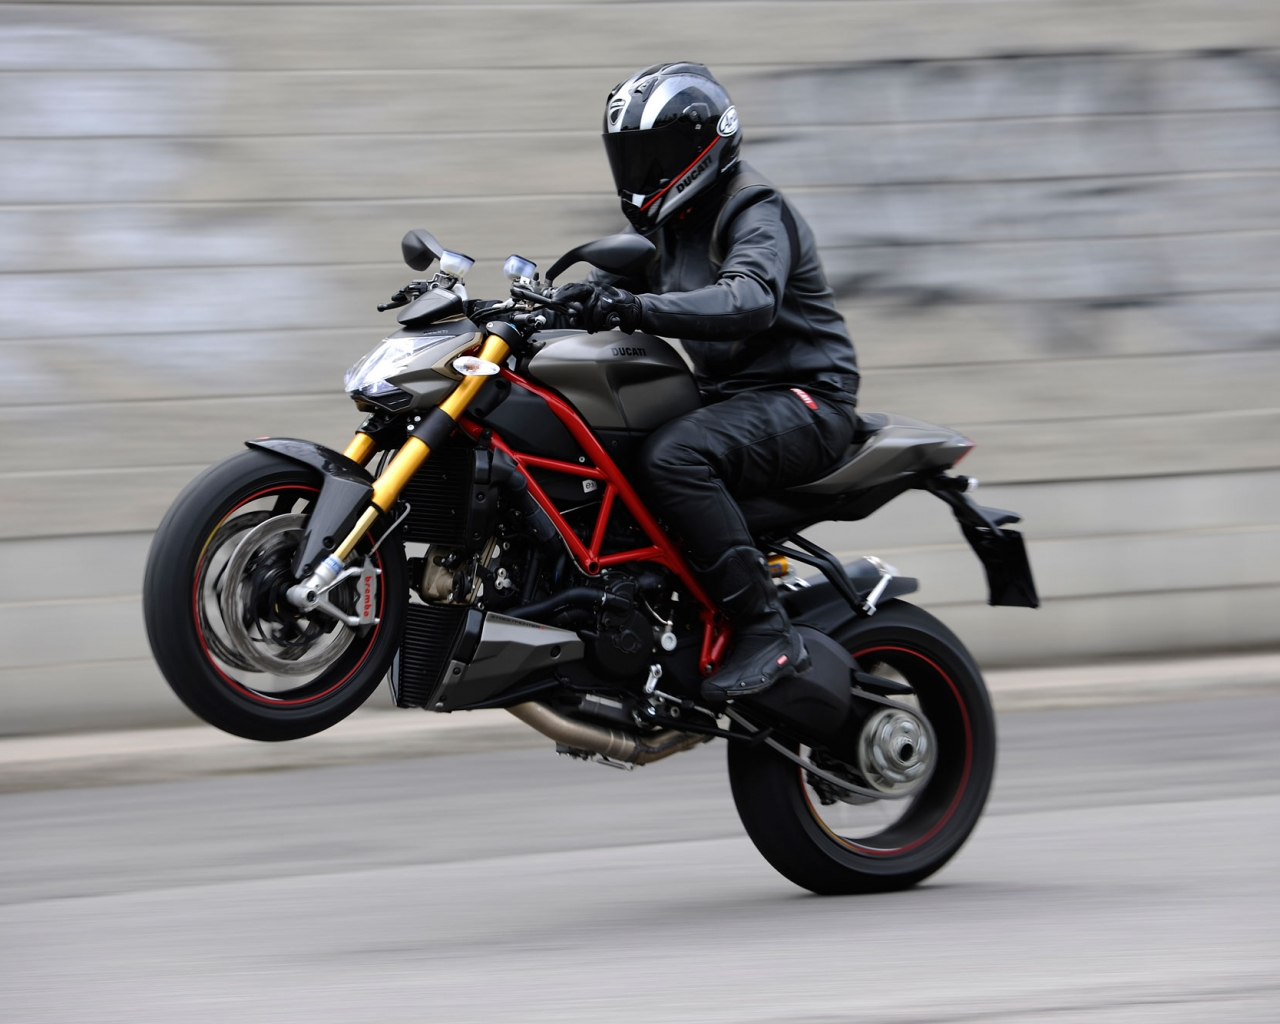 Caballito en Ducati - 1280x1024